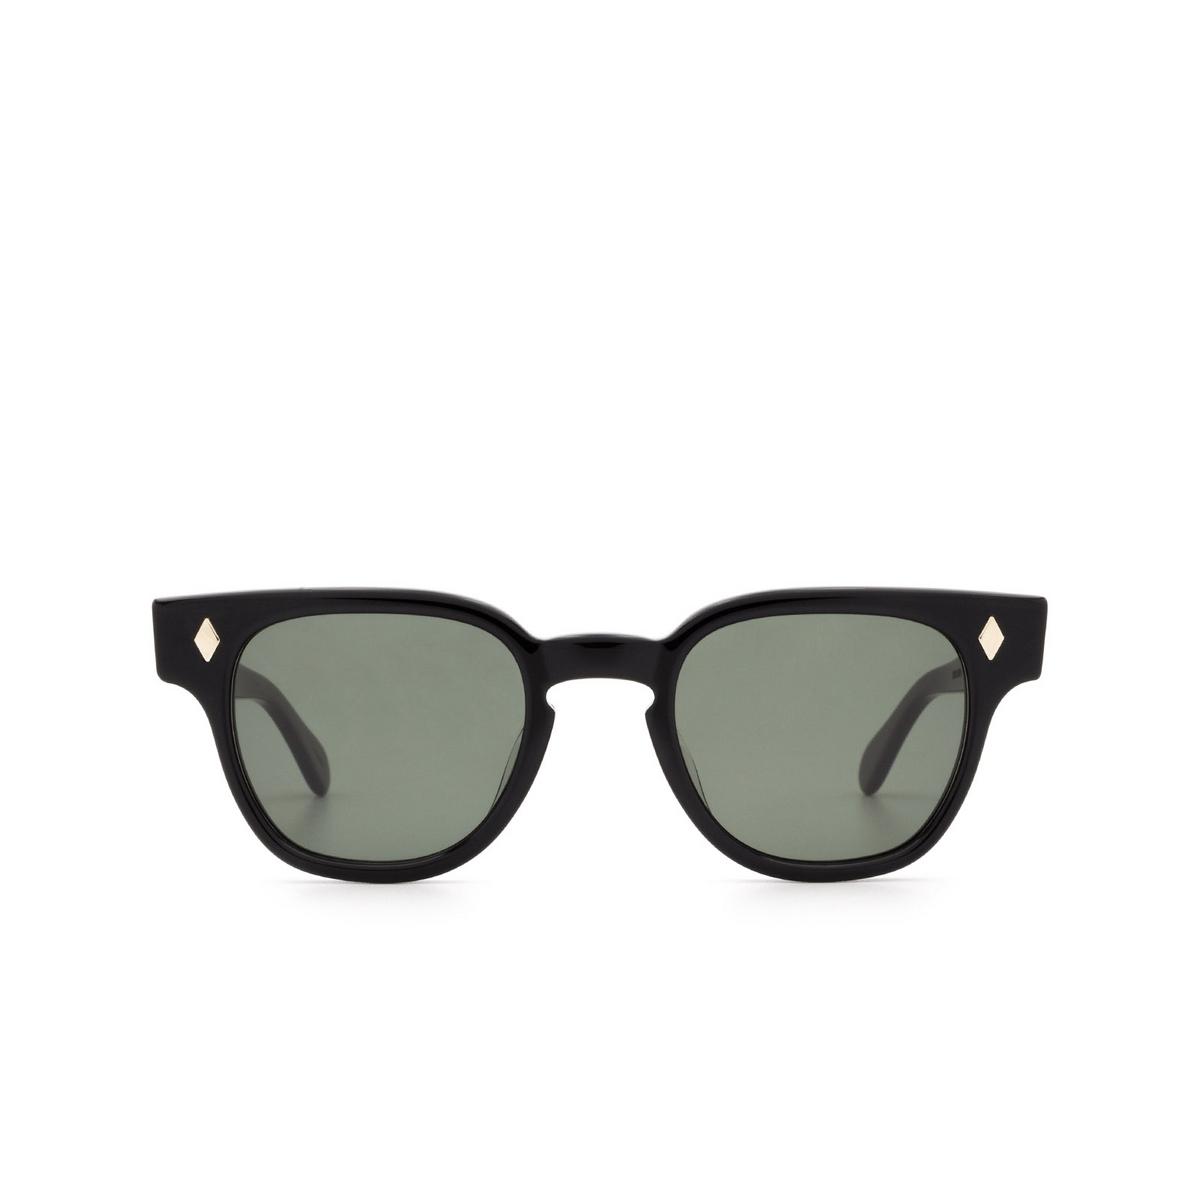 Julius Tart Optical® Square Sunglasses: Bryan Sun color Black.